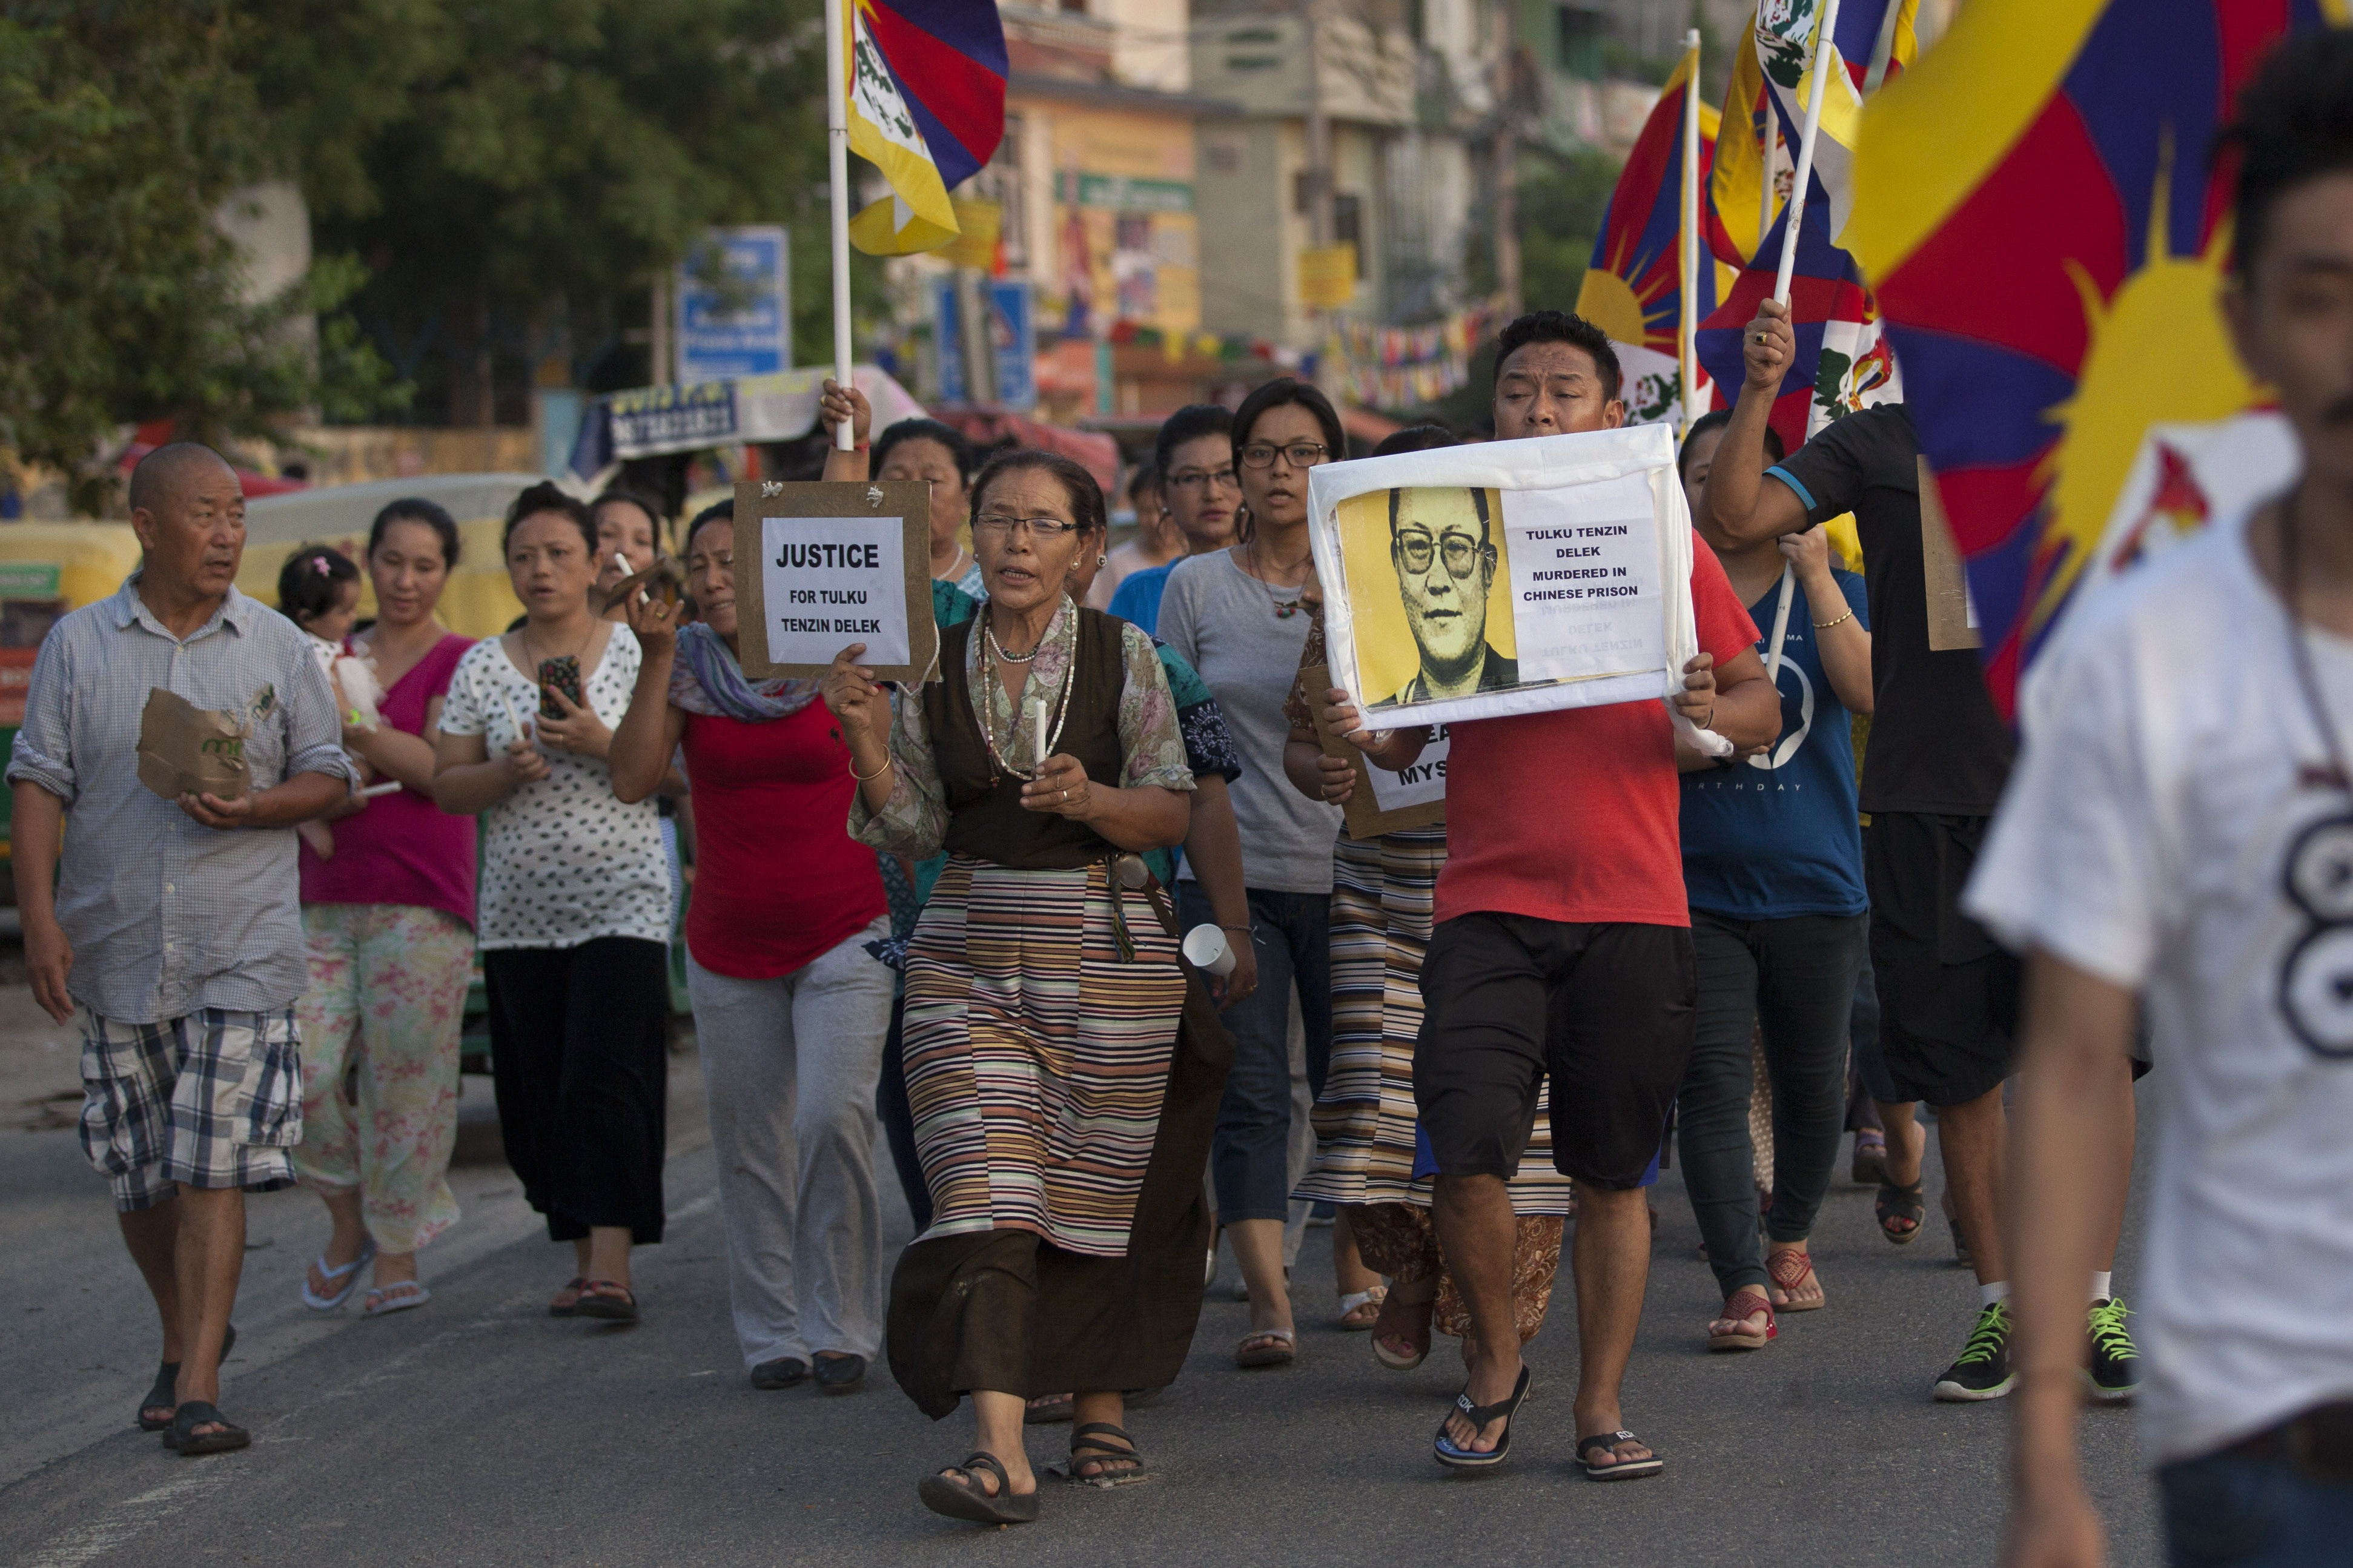 Exile Tibetans walk during a candle light vigil to remember Tibetan lama Tenzin Delek Rinpoche, in New Delhi, India, Monday, July 13, 2015.